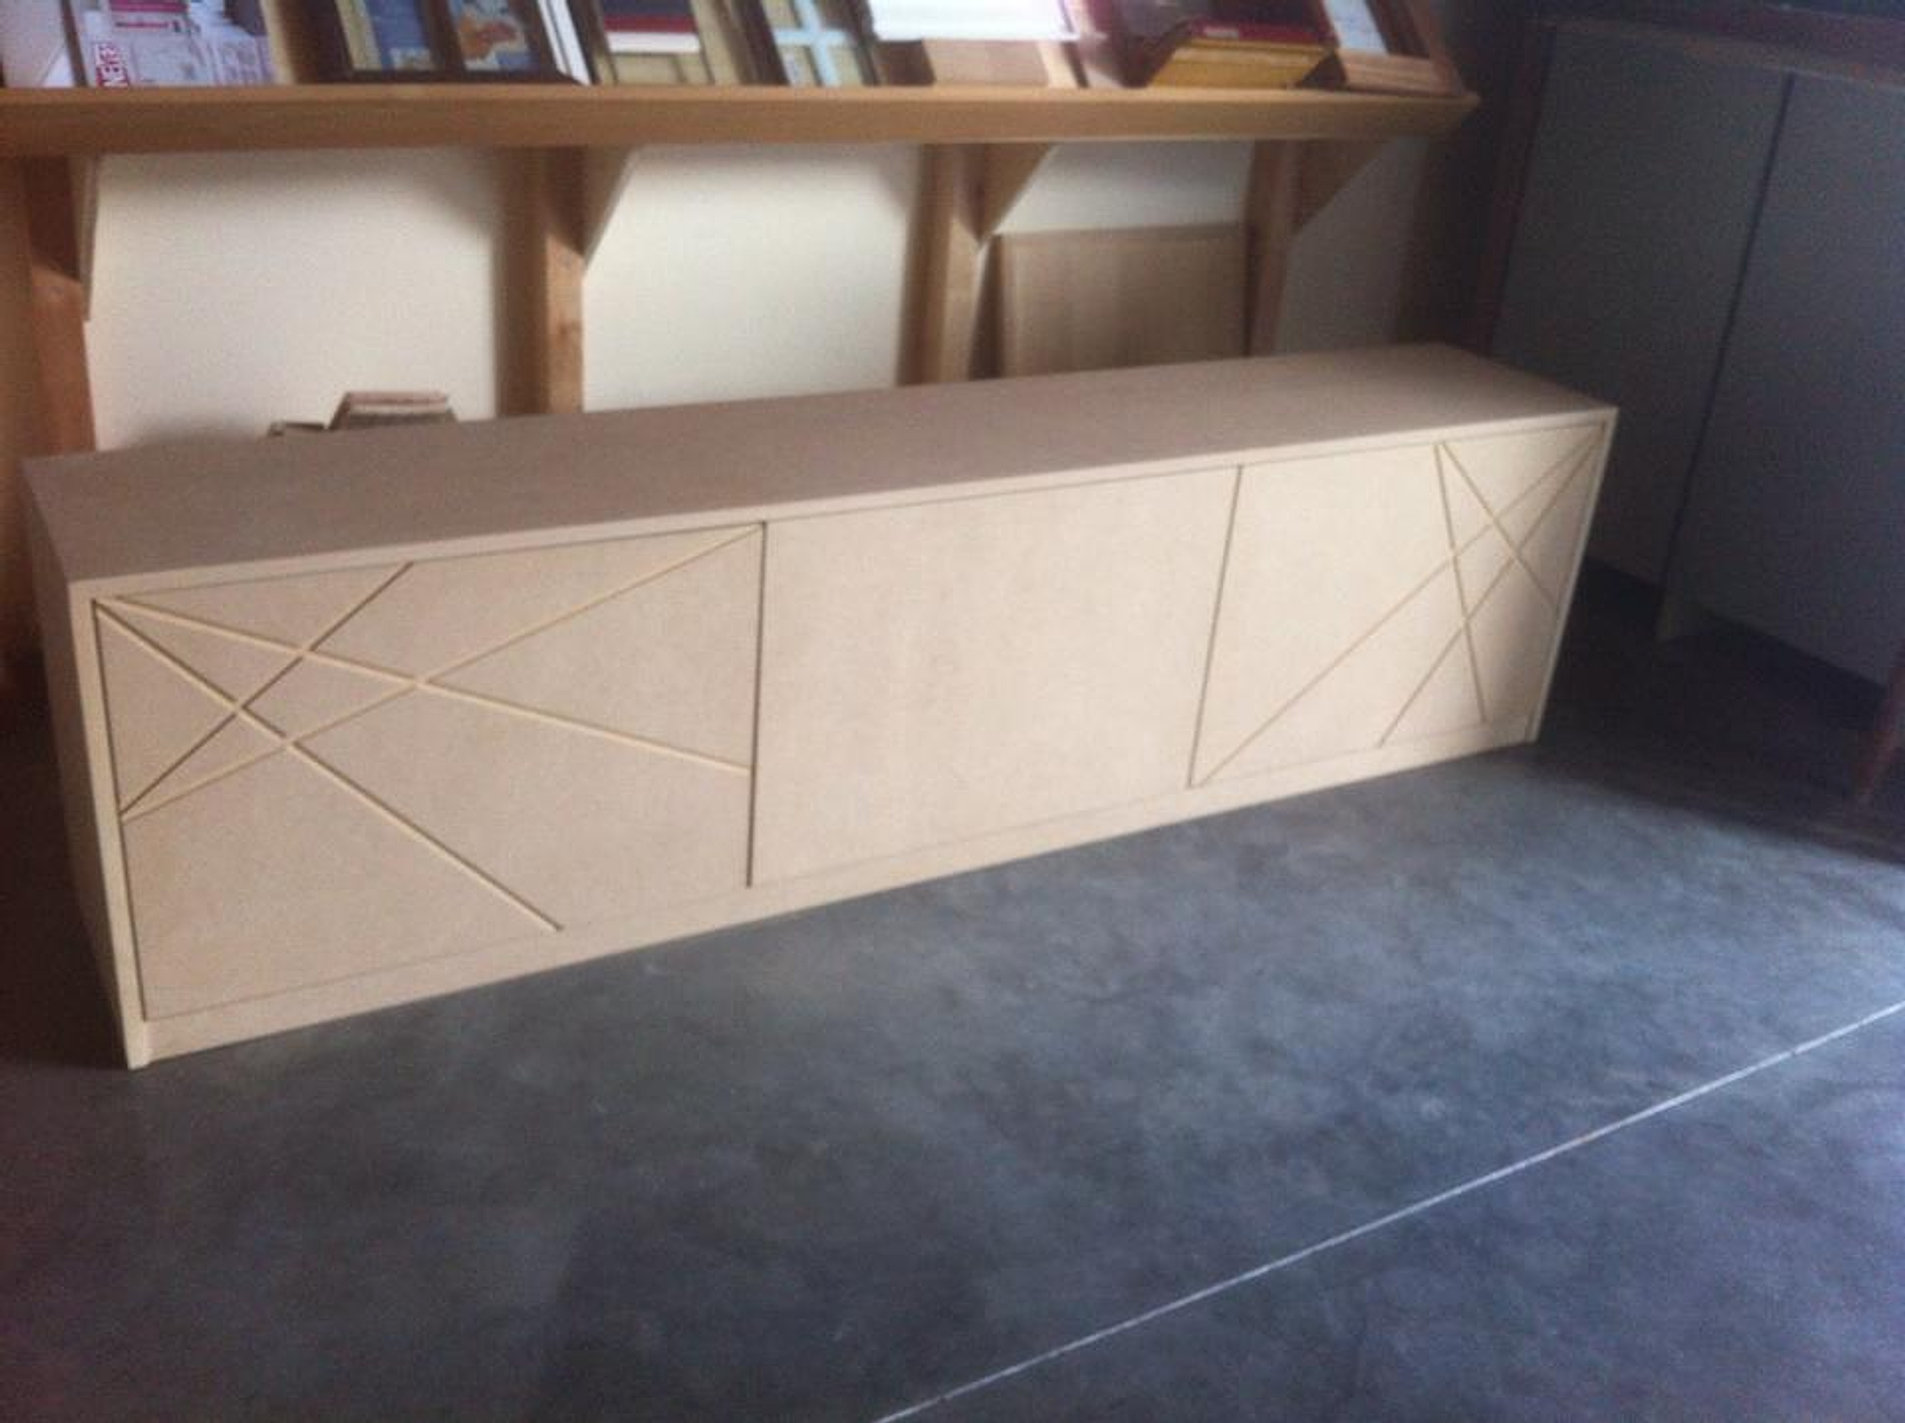 maison vasion tiny house menuiserie reynaud bois galerie. Black Bedroom Furniture Sets. Home Design Ideas